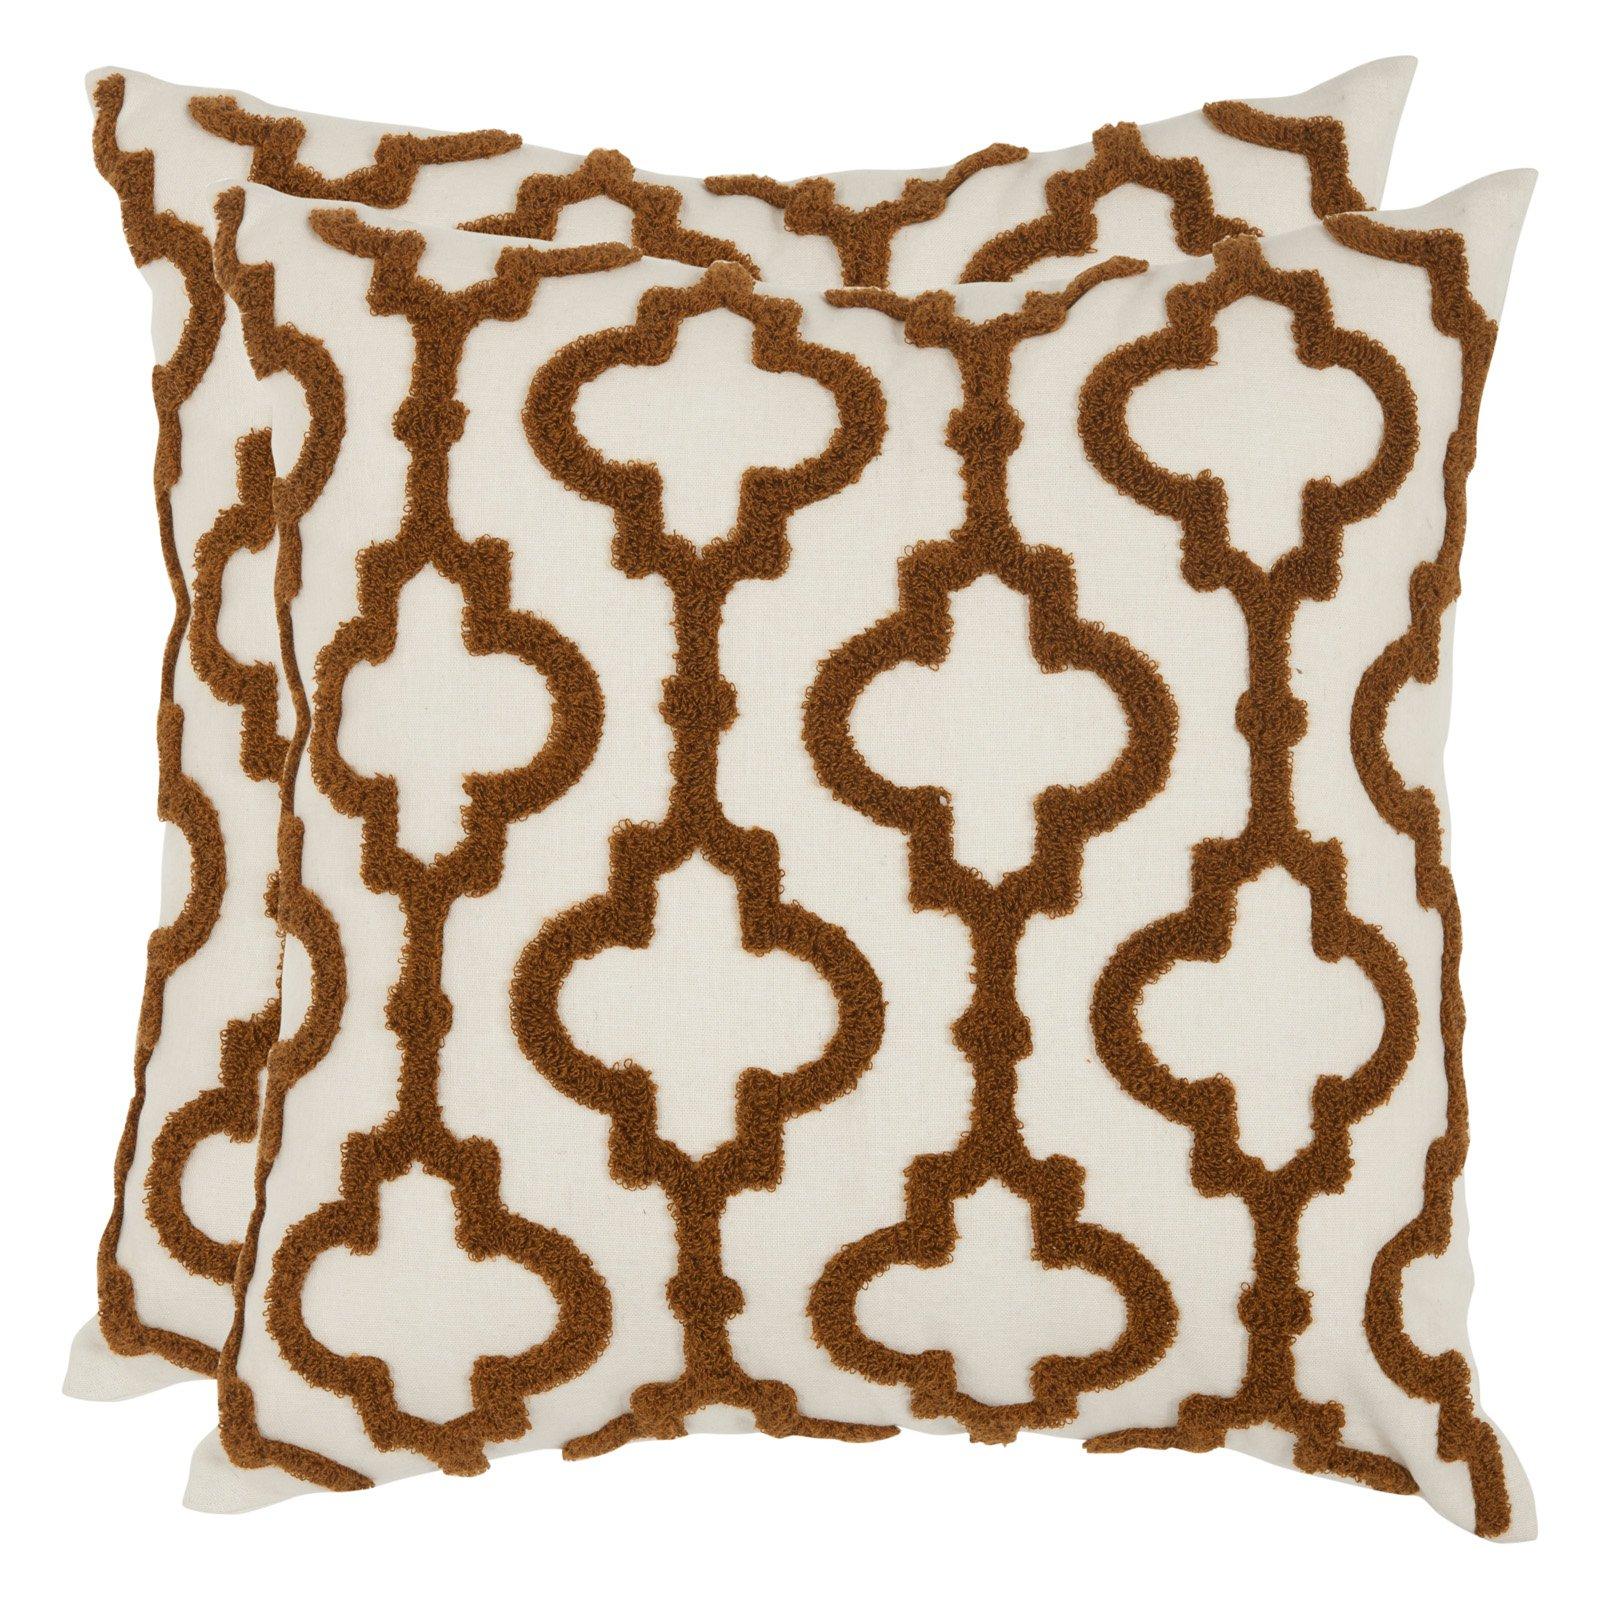 Safavieh Lucy Decorative Pillow - Set of 2